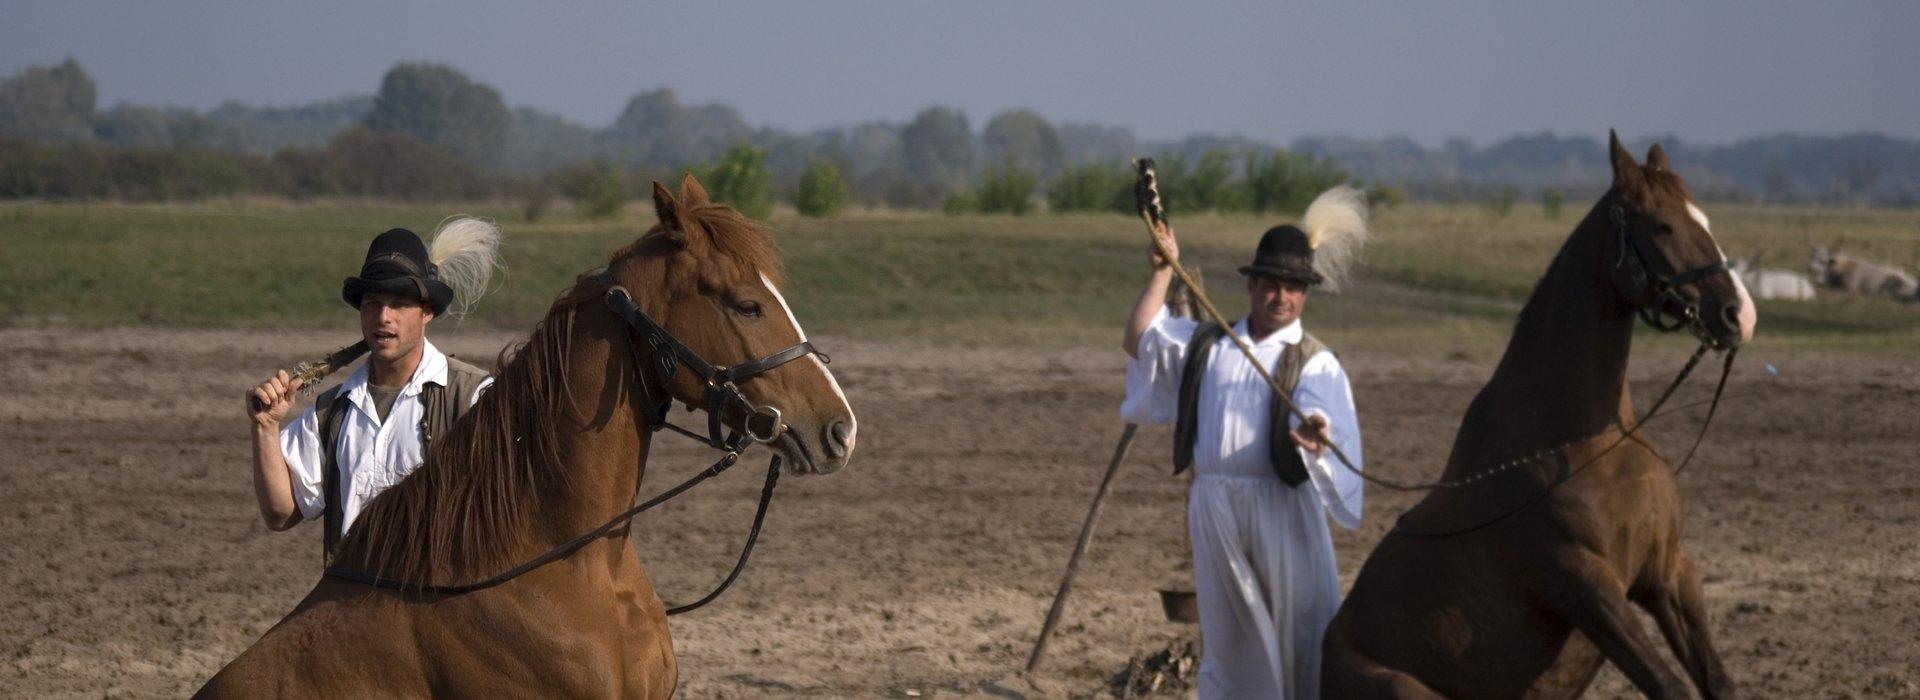 Hortobágy Culture – Cultural life of Hortobágy